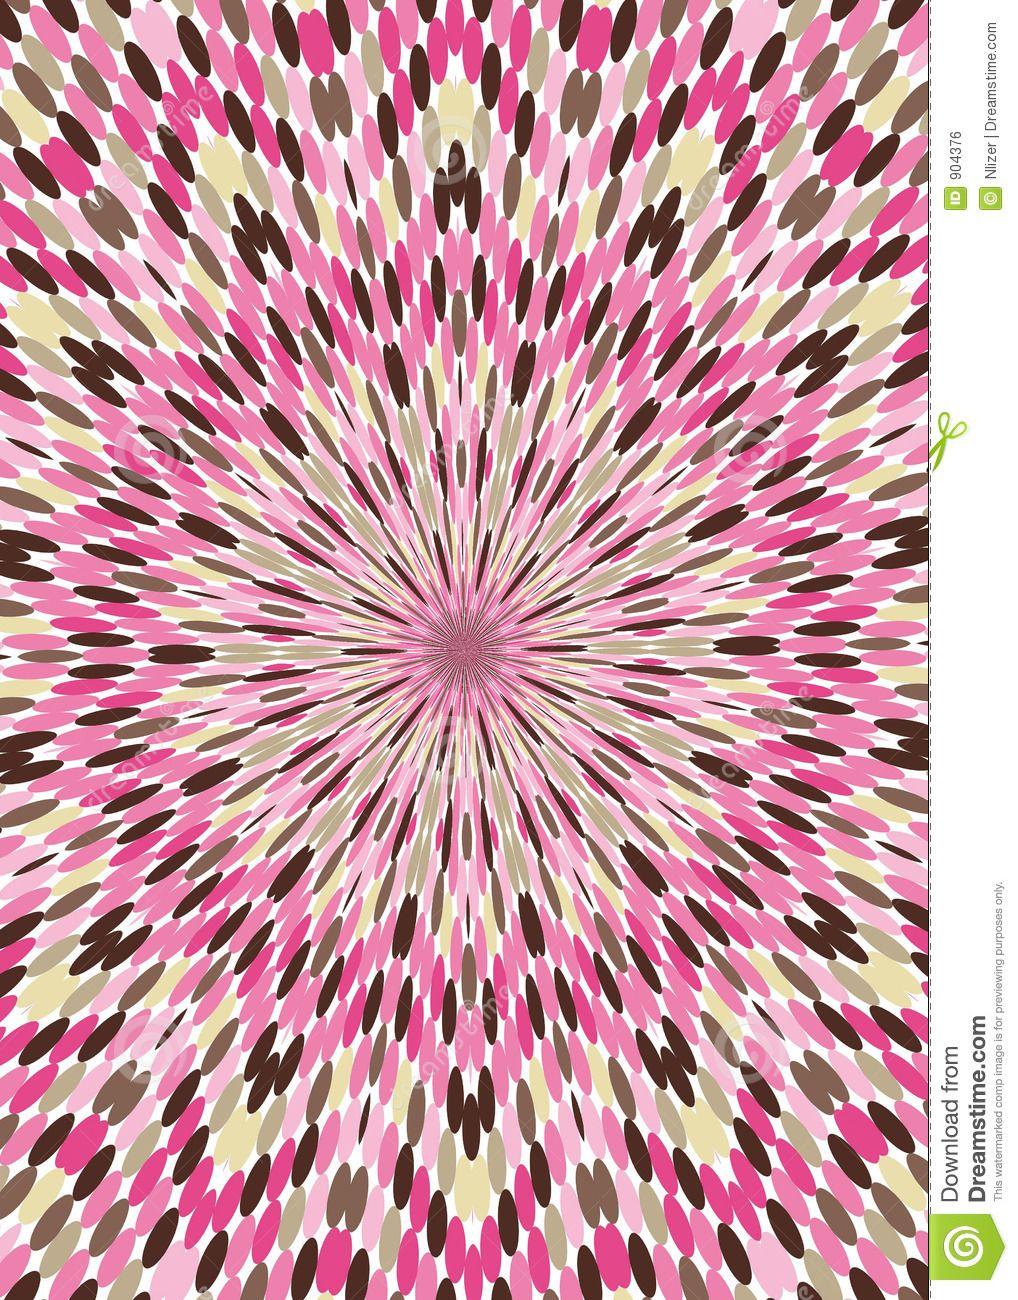 Pink Brown Kaleidoscope Wallpaper Background Royalty Free Stock ...